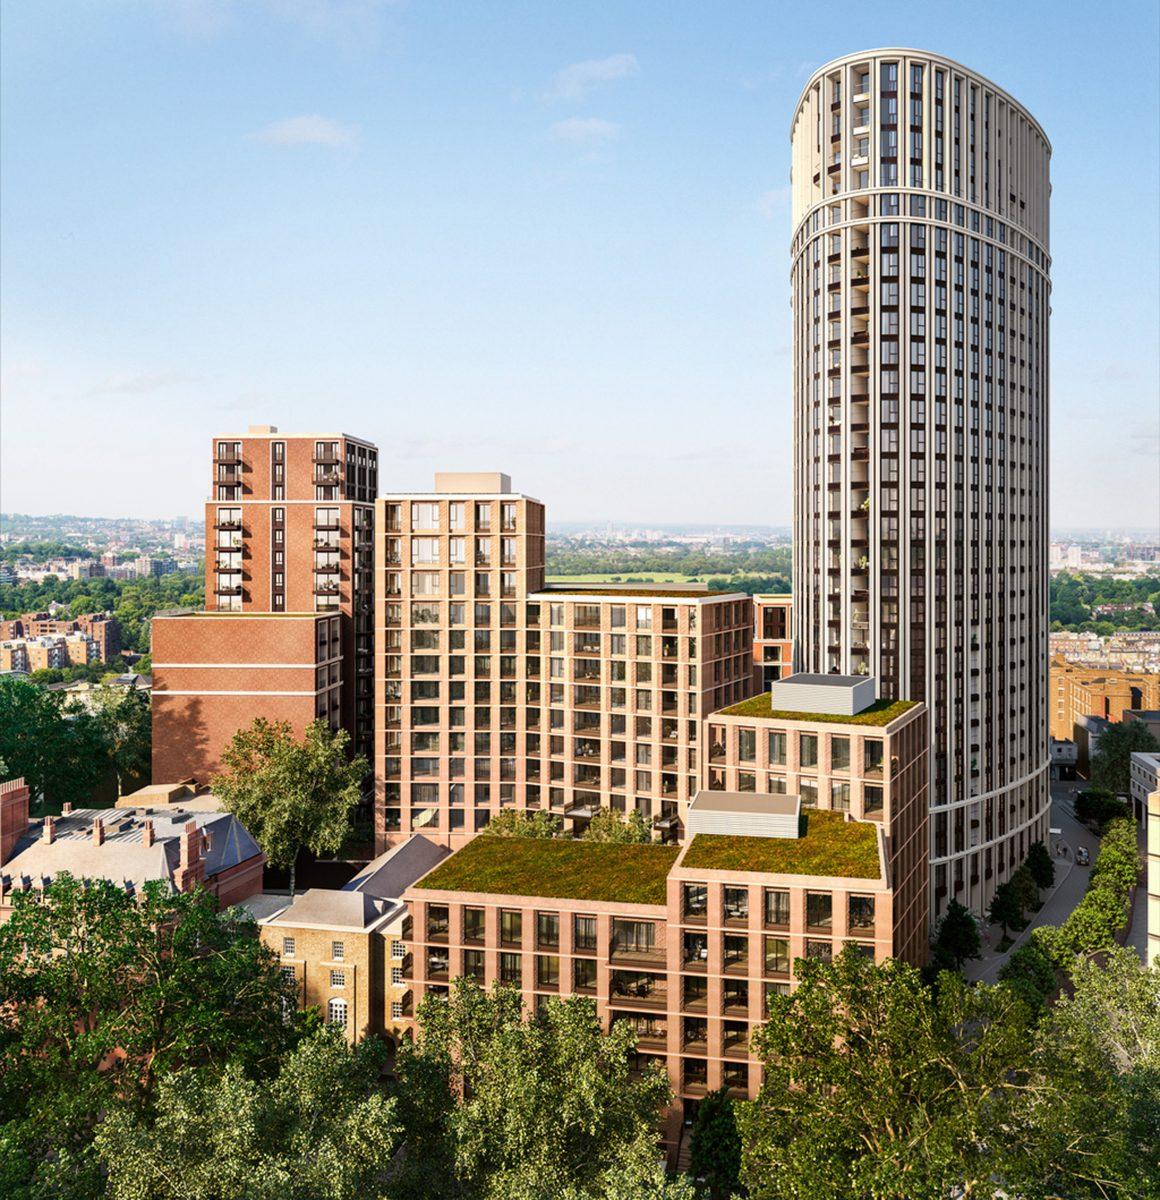 westmark tower london modern georgian architecture berkeley homes architects jersey14